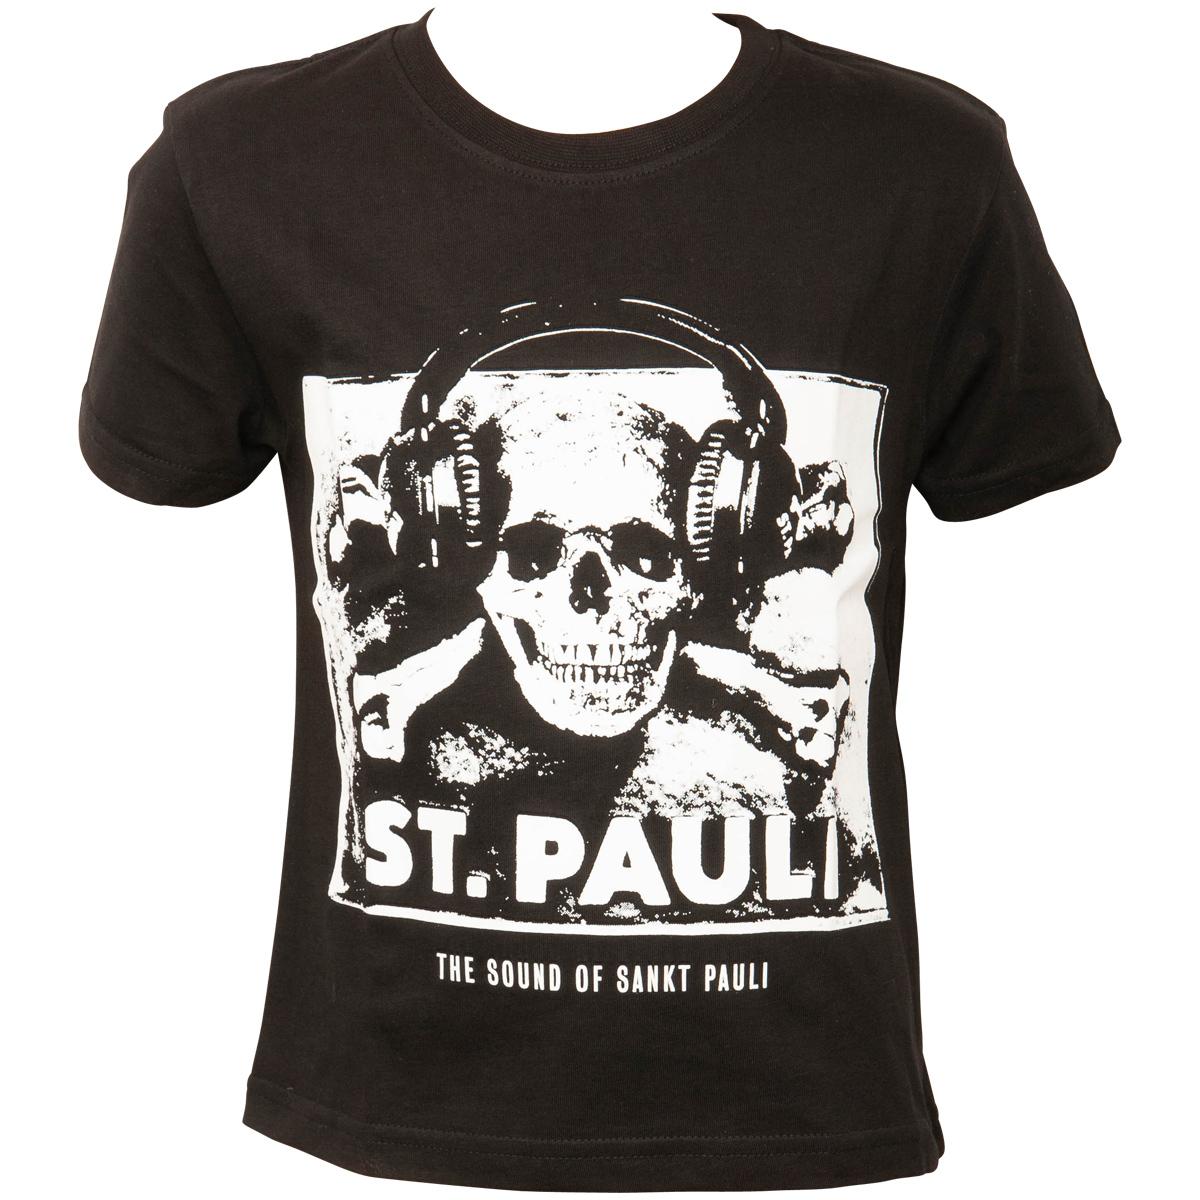 FC St. Pauli - Kinder T-Shirt Sound - schwarz